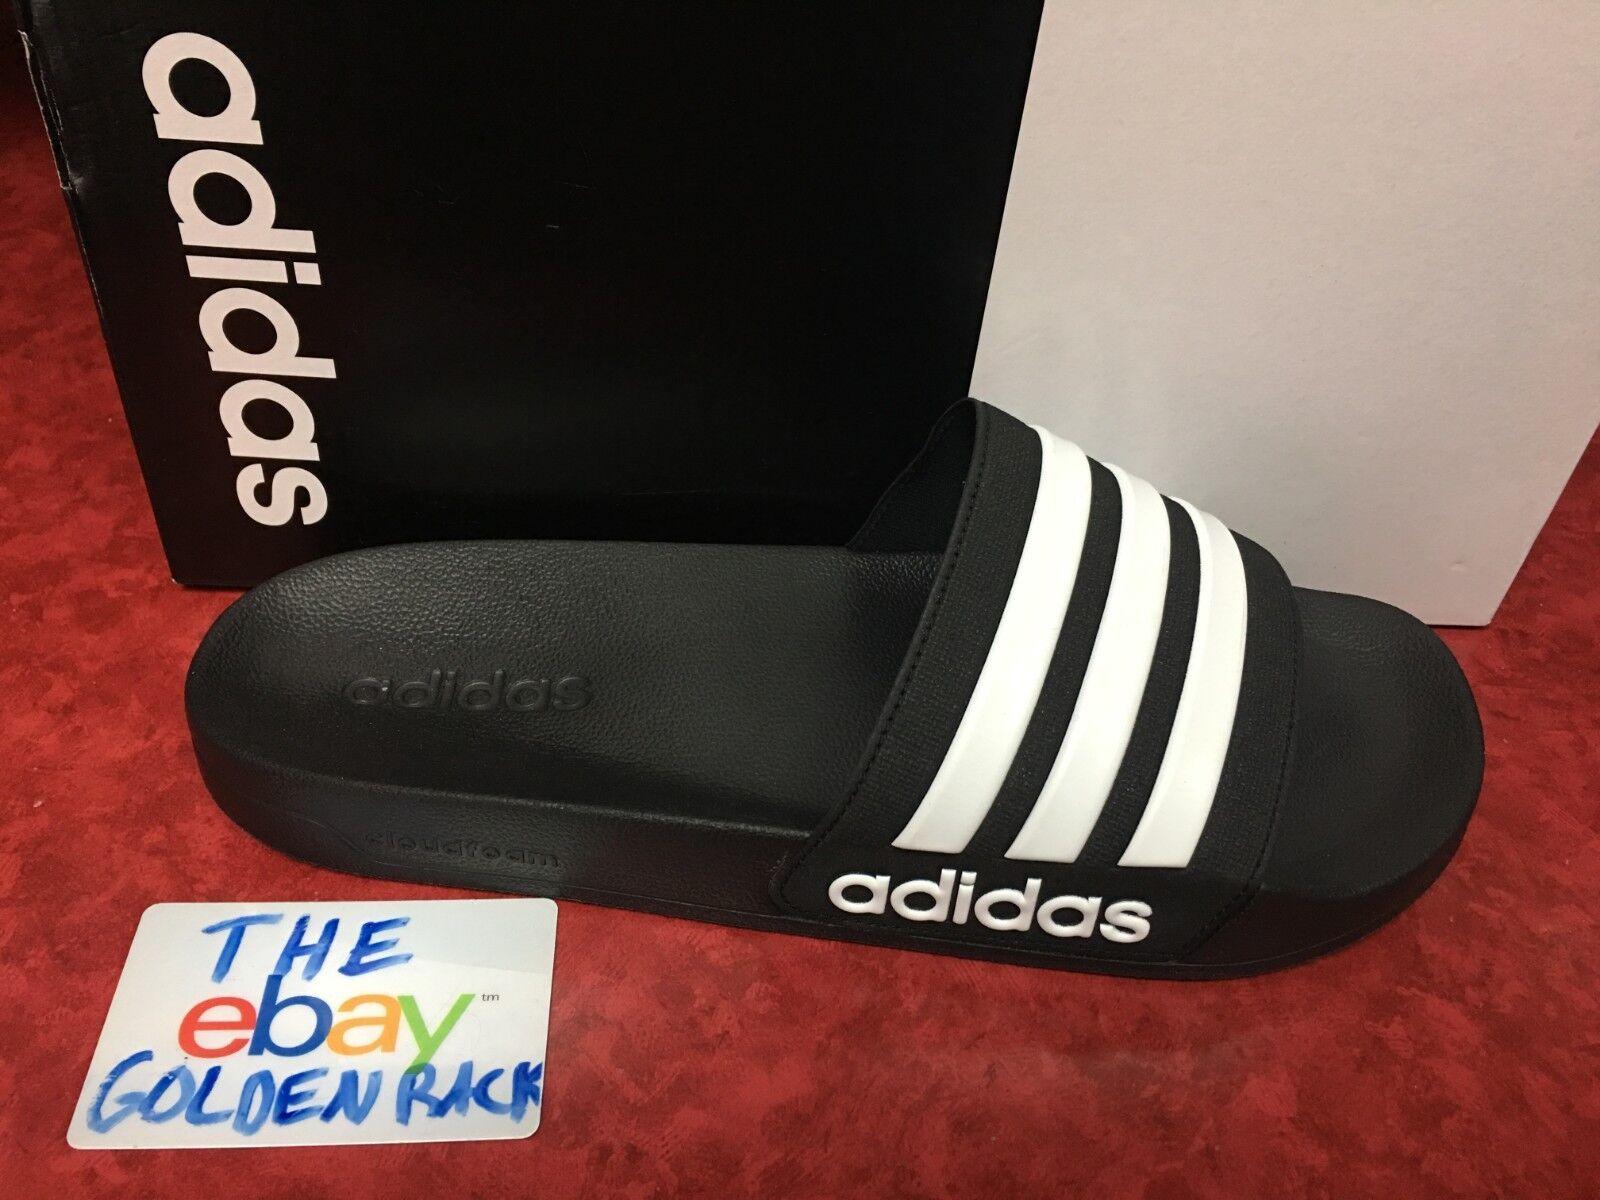 Adidas CF Adilette Slides Sandal Slippers AQ1701 Black/White